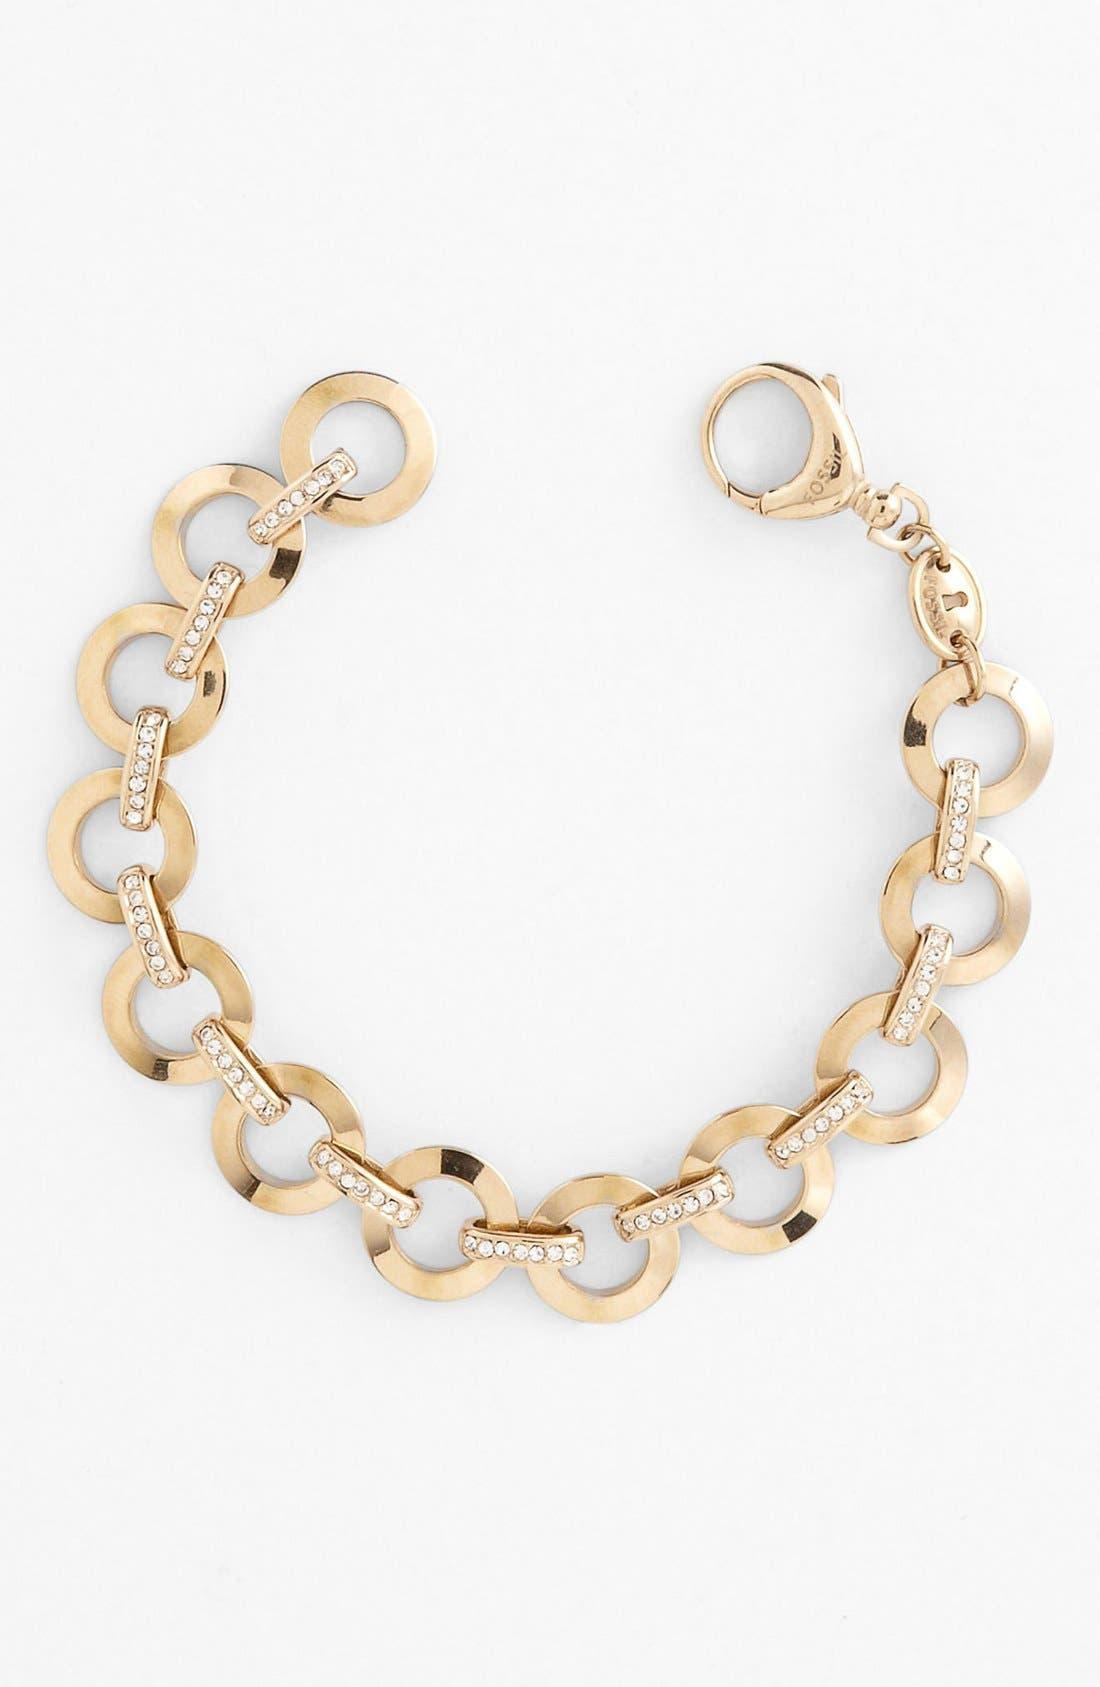 Main Image - Fossil Circle Link Charm Bracelet